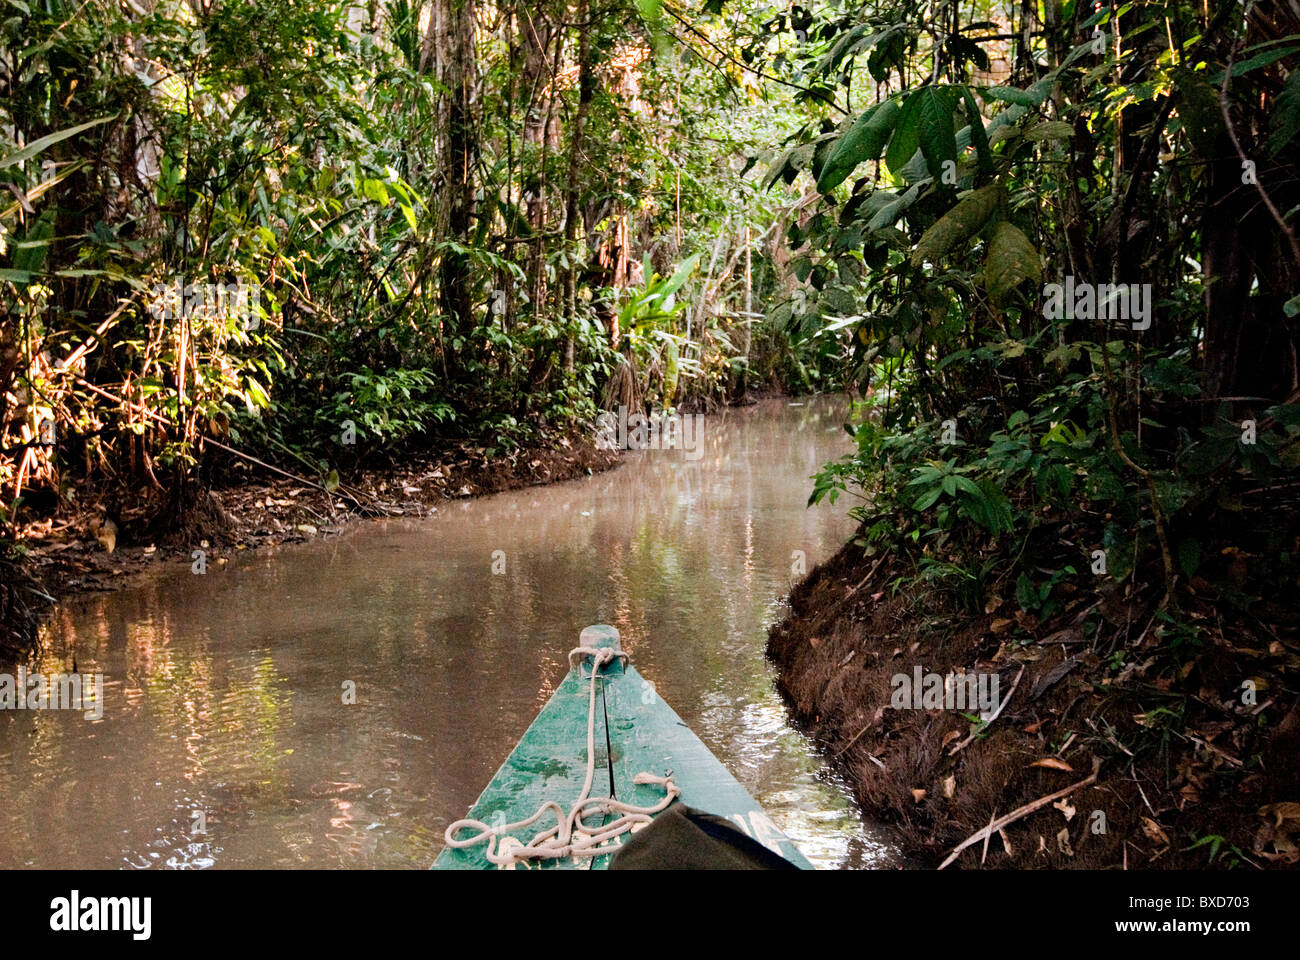 Forêt Amazonienne, Maldanado Puerto, au Pérou. Photo Stock